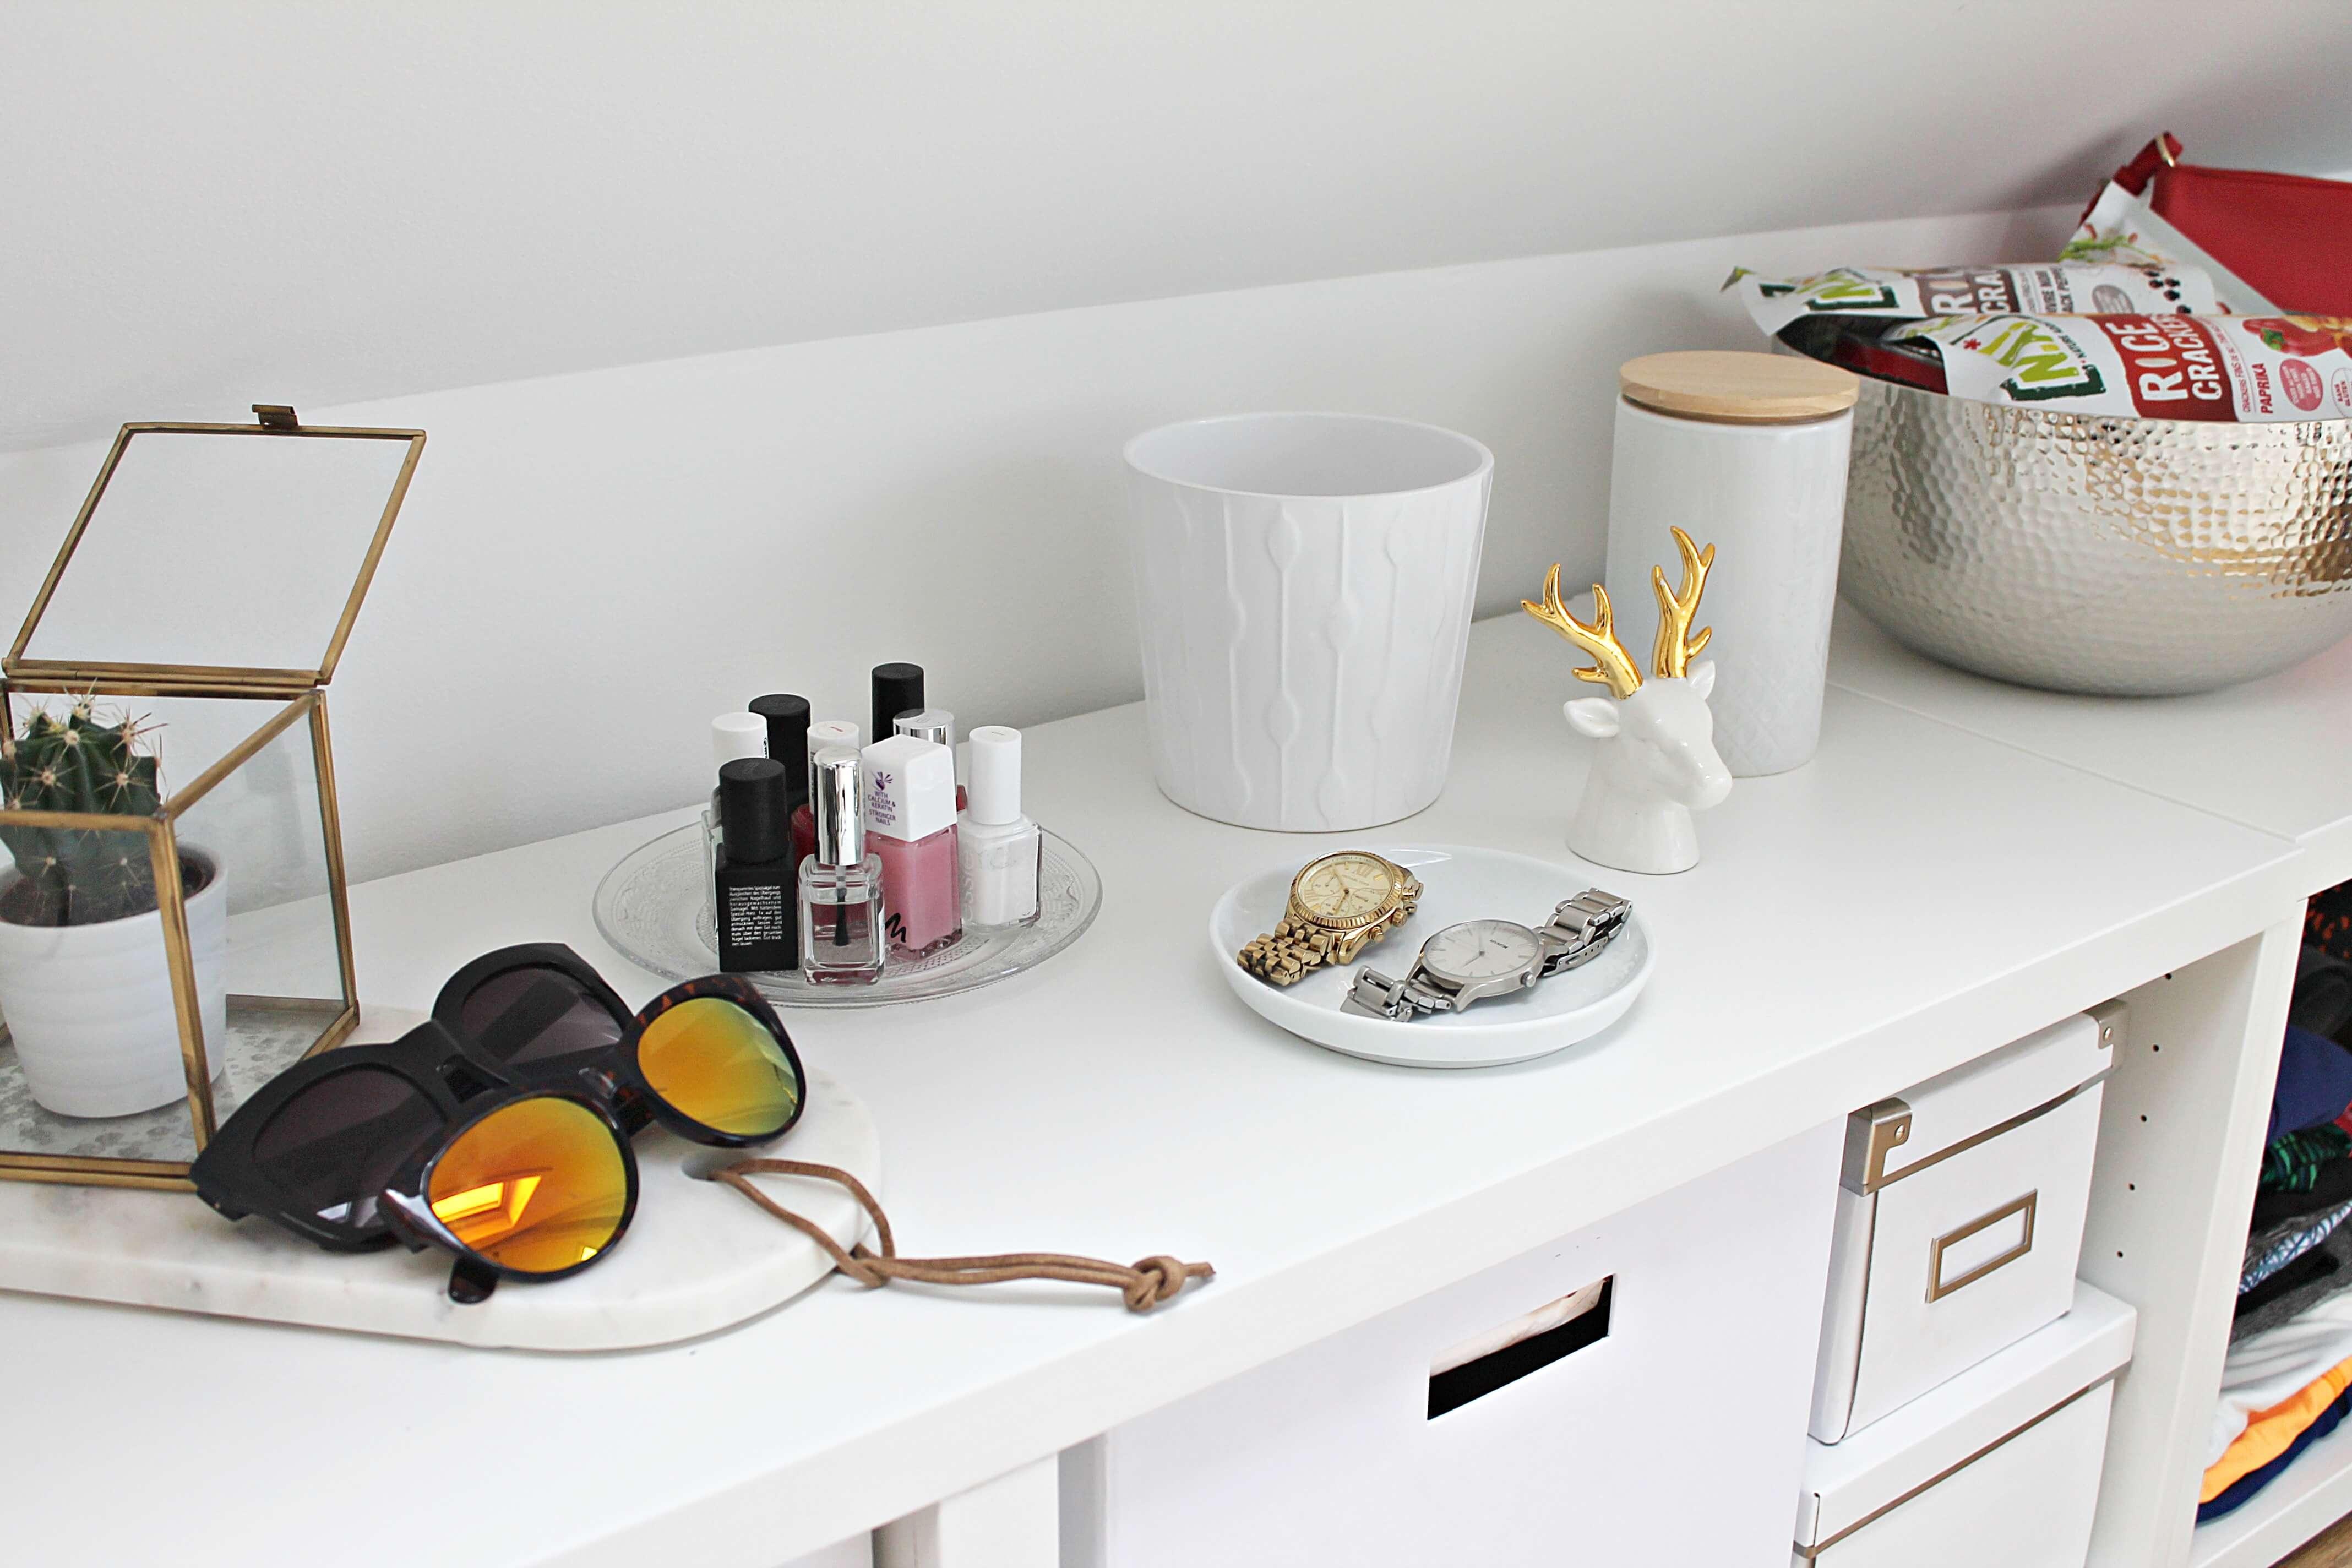 deko impressionen fithealthydi do live. Black Bedroom Furniture Sets. Home Design Ideas